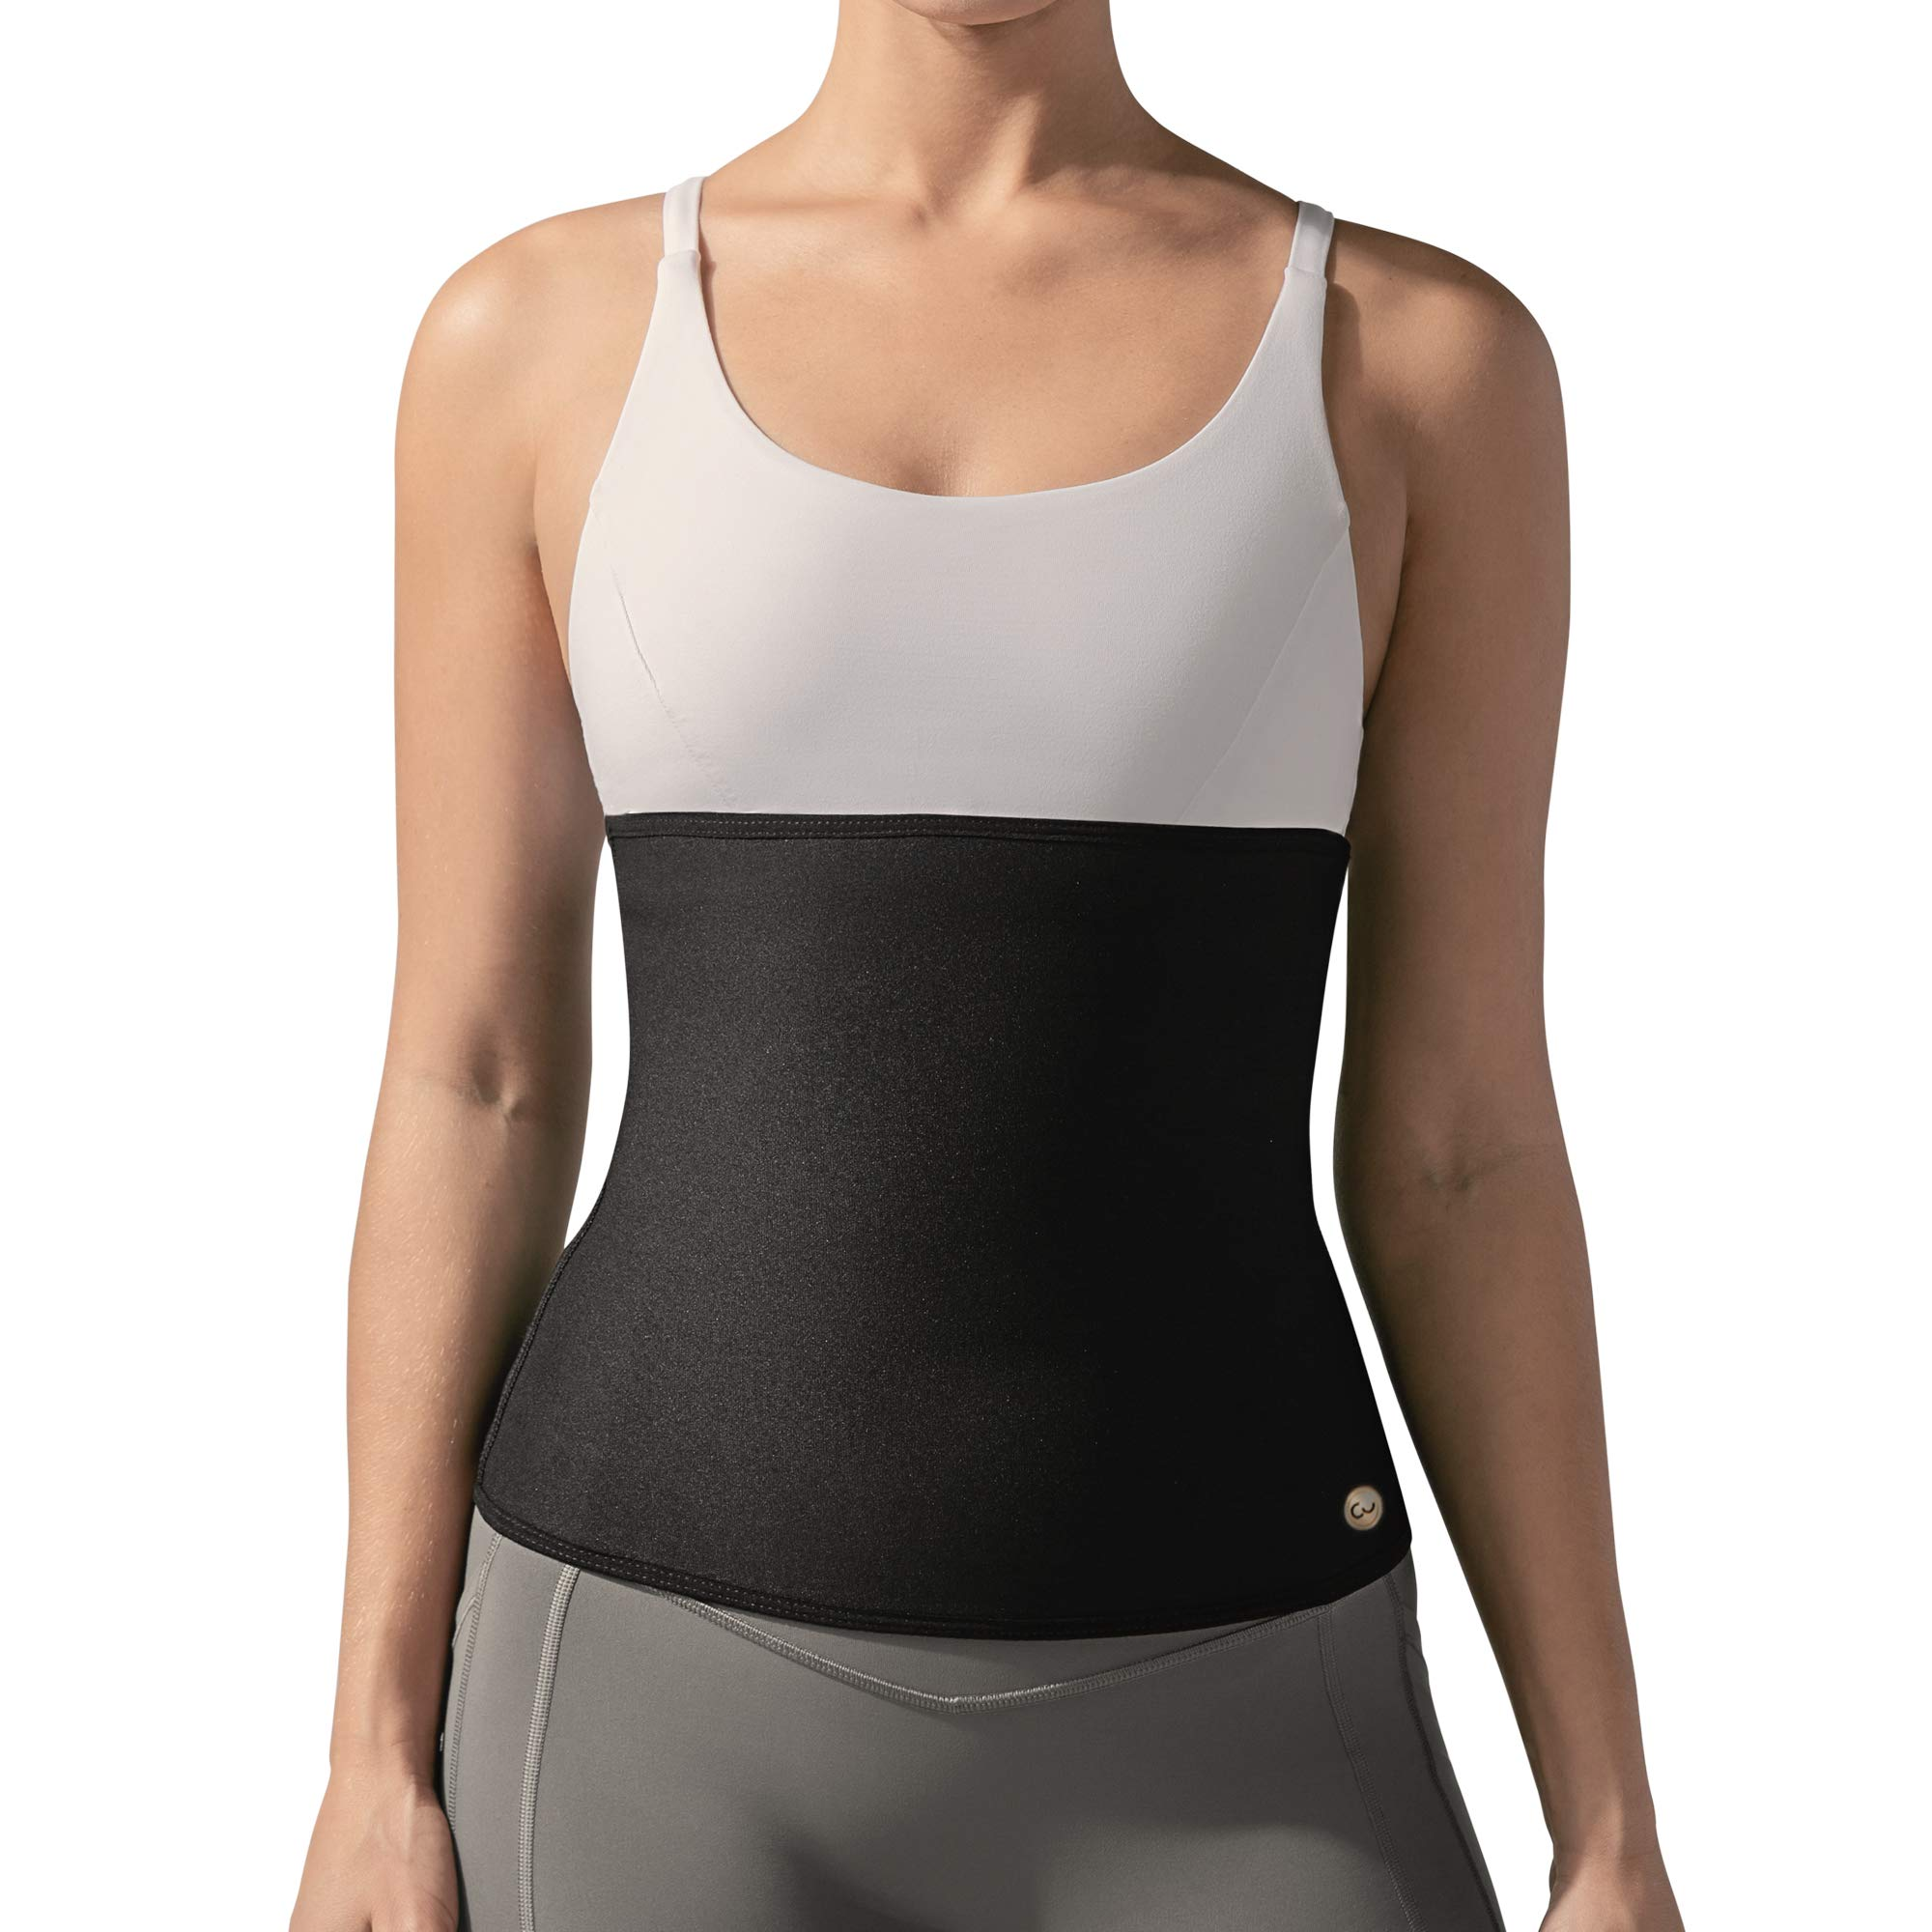 Copper Slim Compression Waist Belt for Women - Workout Belt Increases Sweat & Circulation (Black, M) by Copper Slim